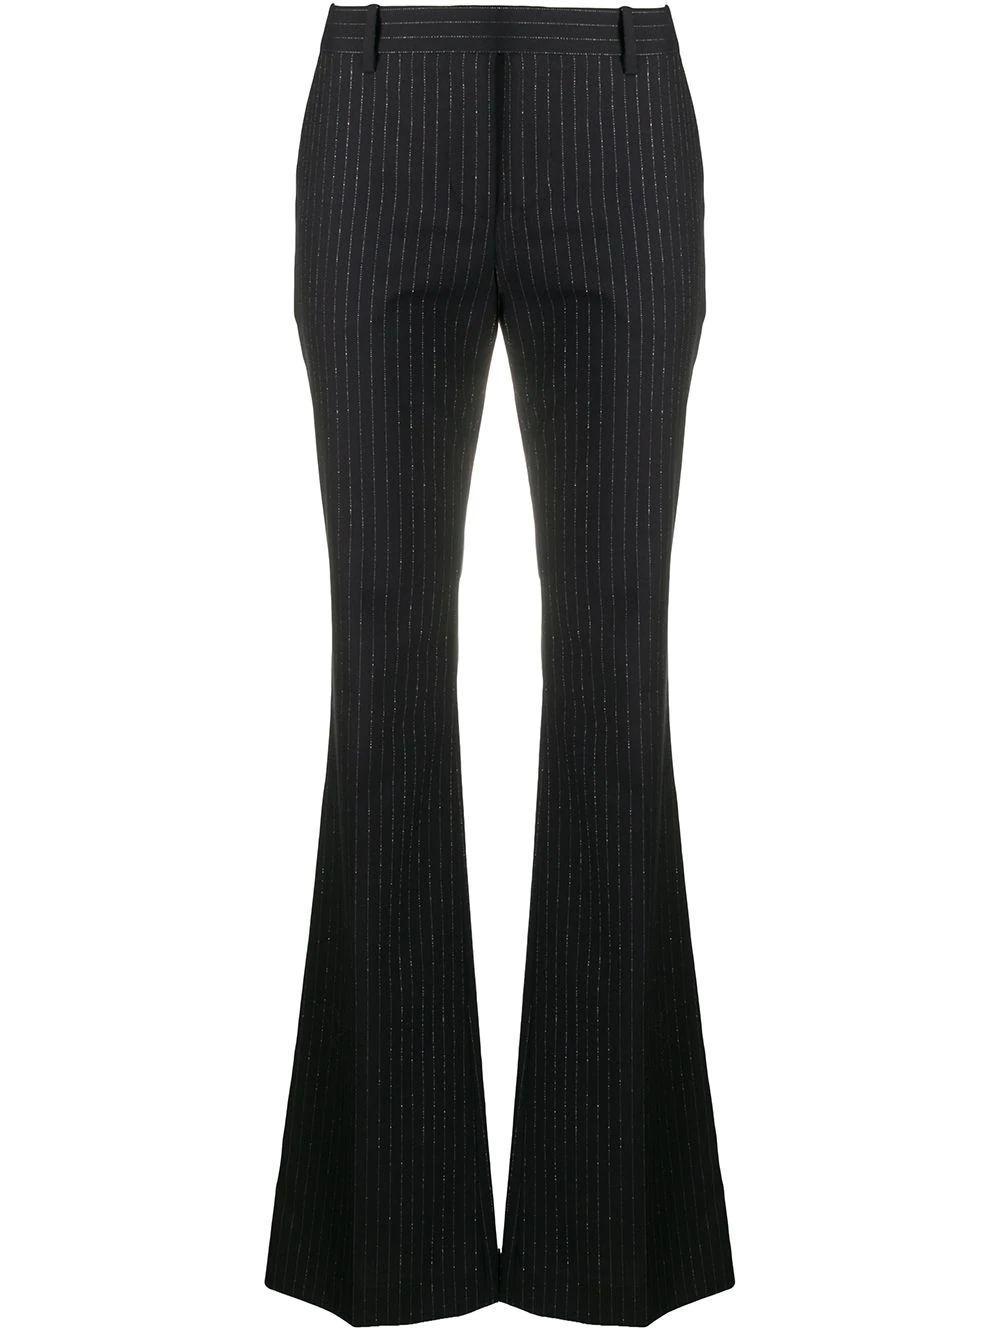 Narrow Bootcut Trouser Item # 631930QJABF